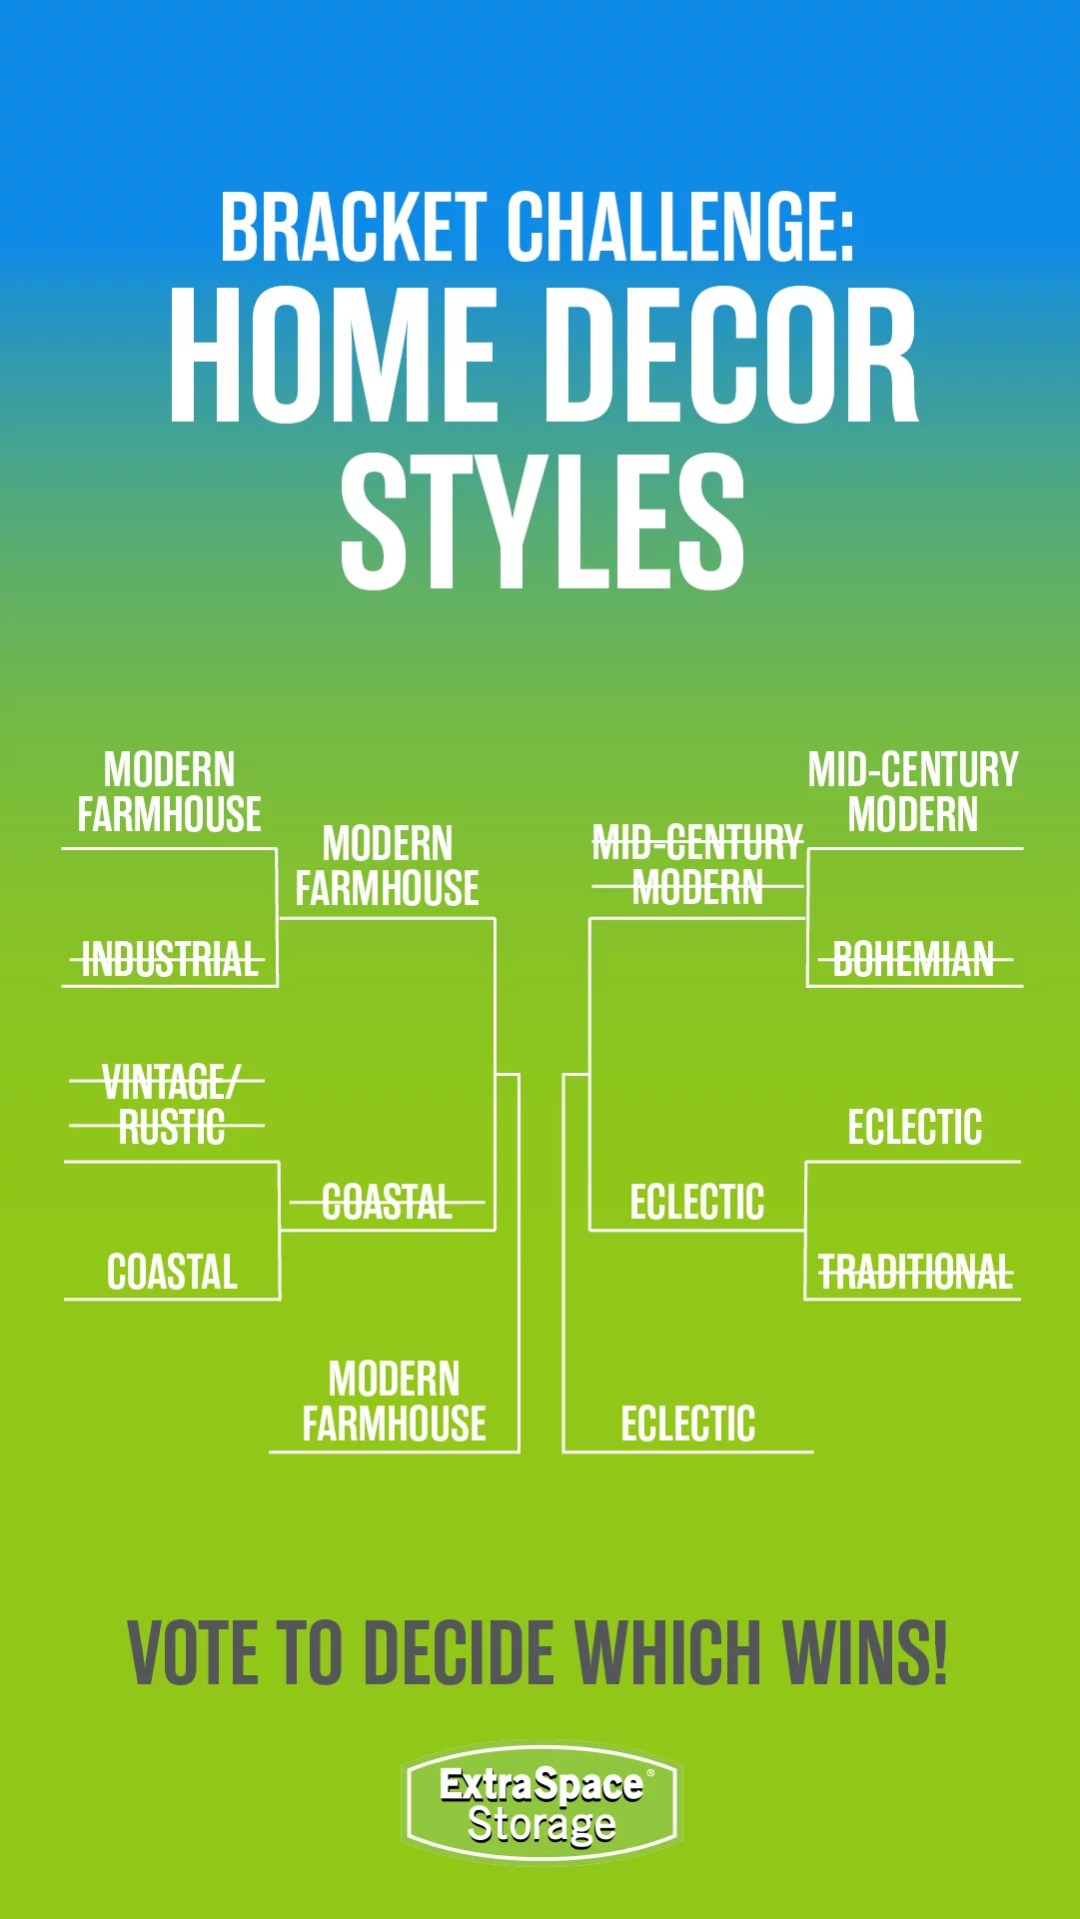 Extra Space Storage Bracket Challenge Infographic: Home Decor Styles